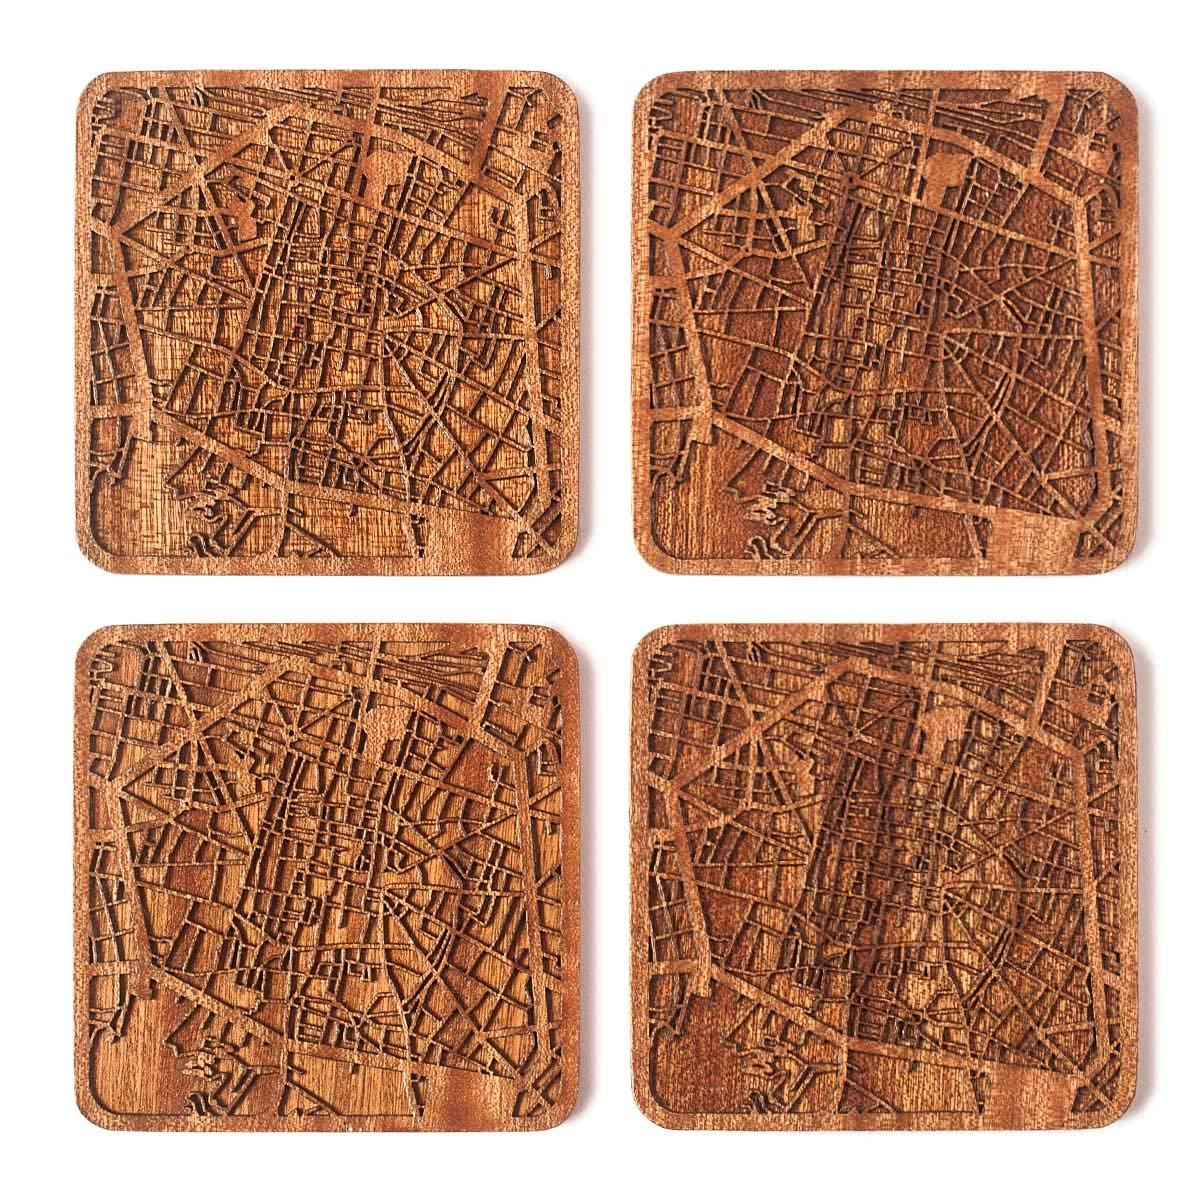 Bologna Map Coaster, Set of 4, Sapele Wooden